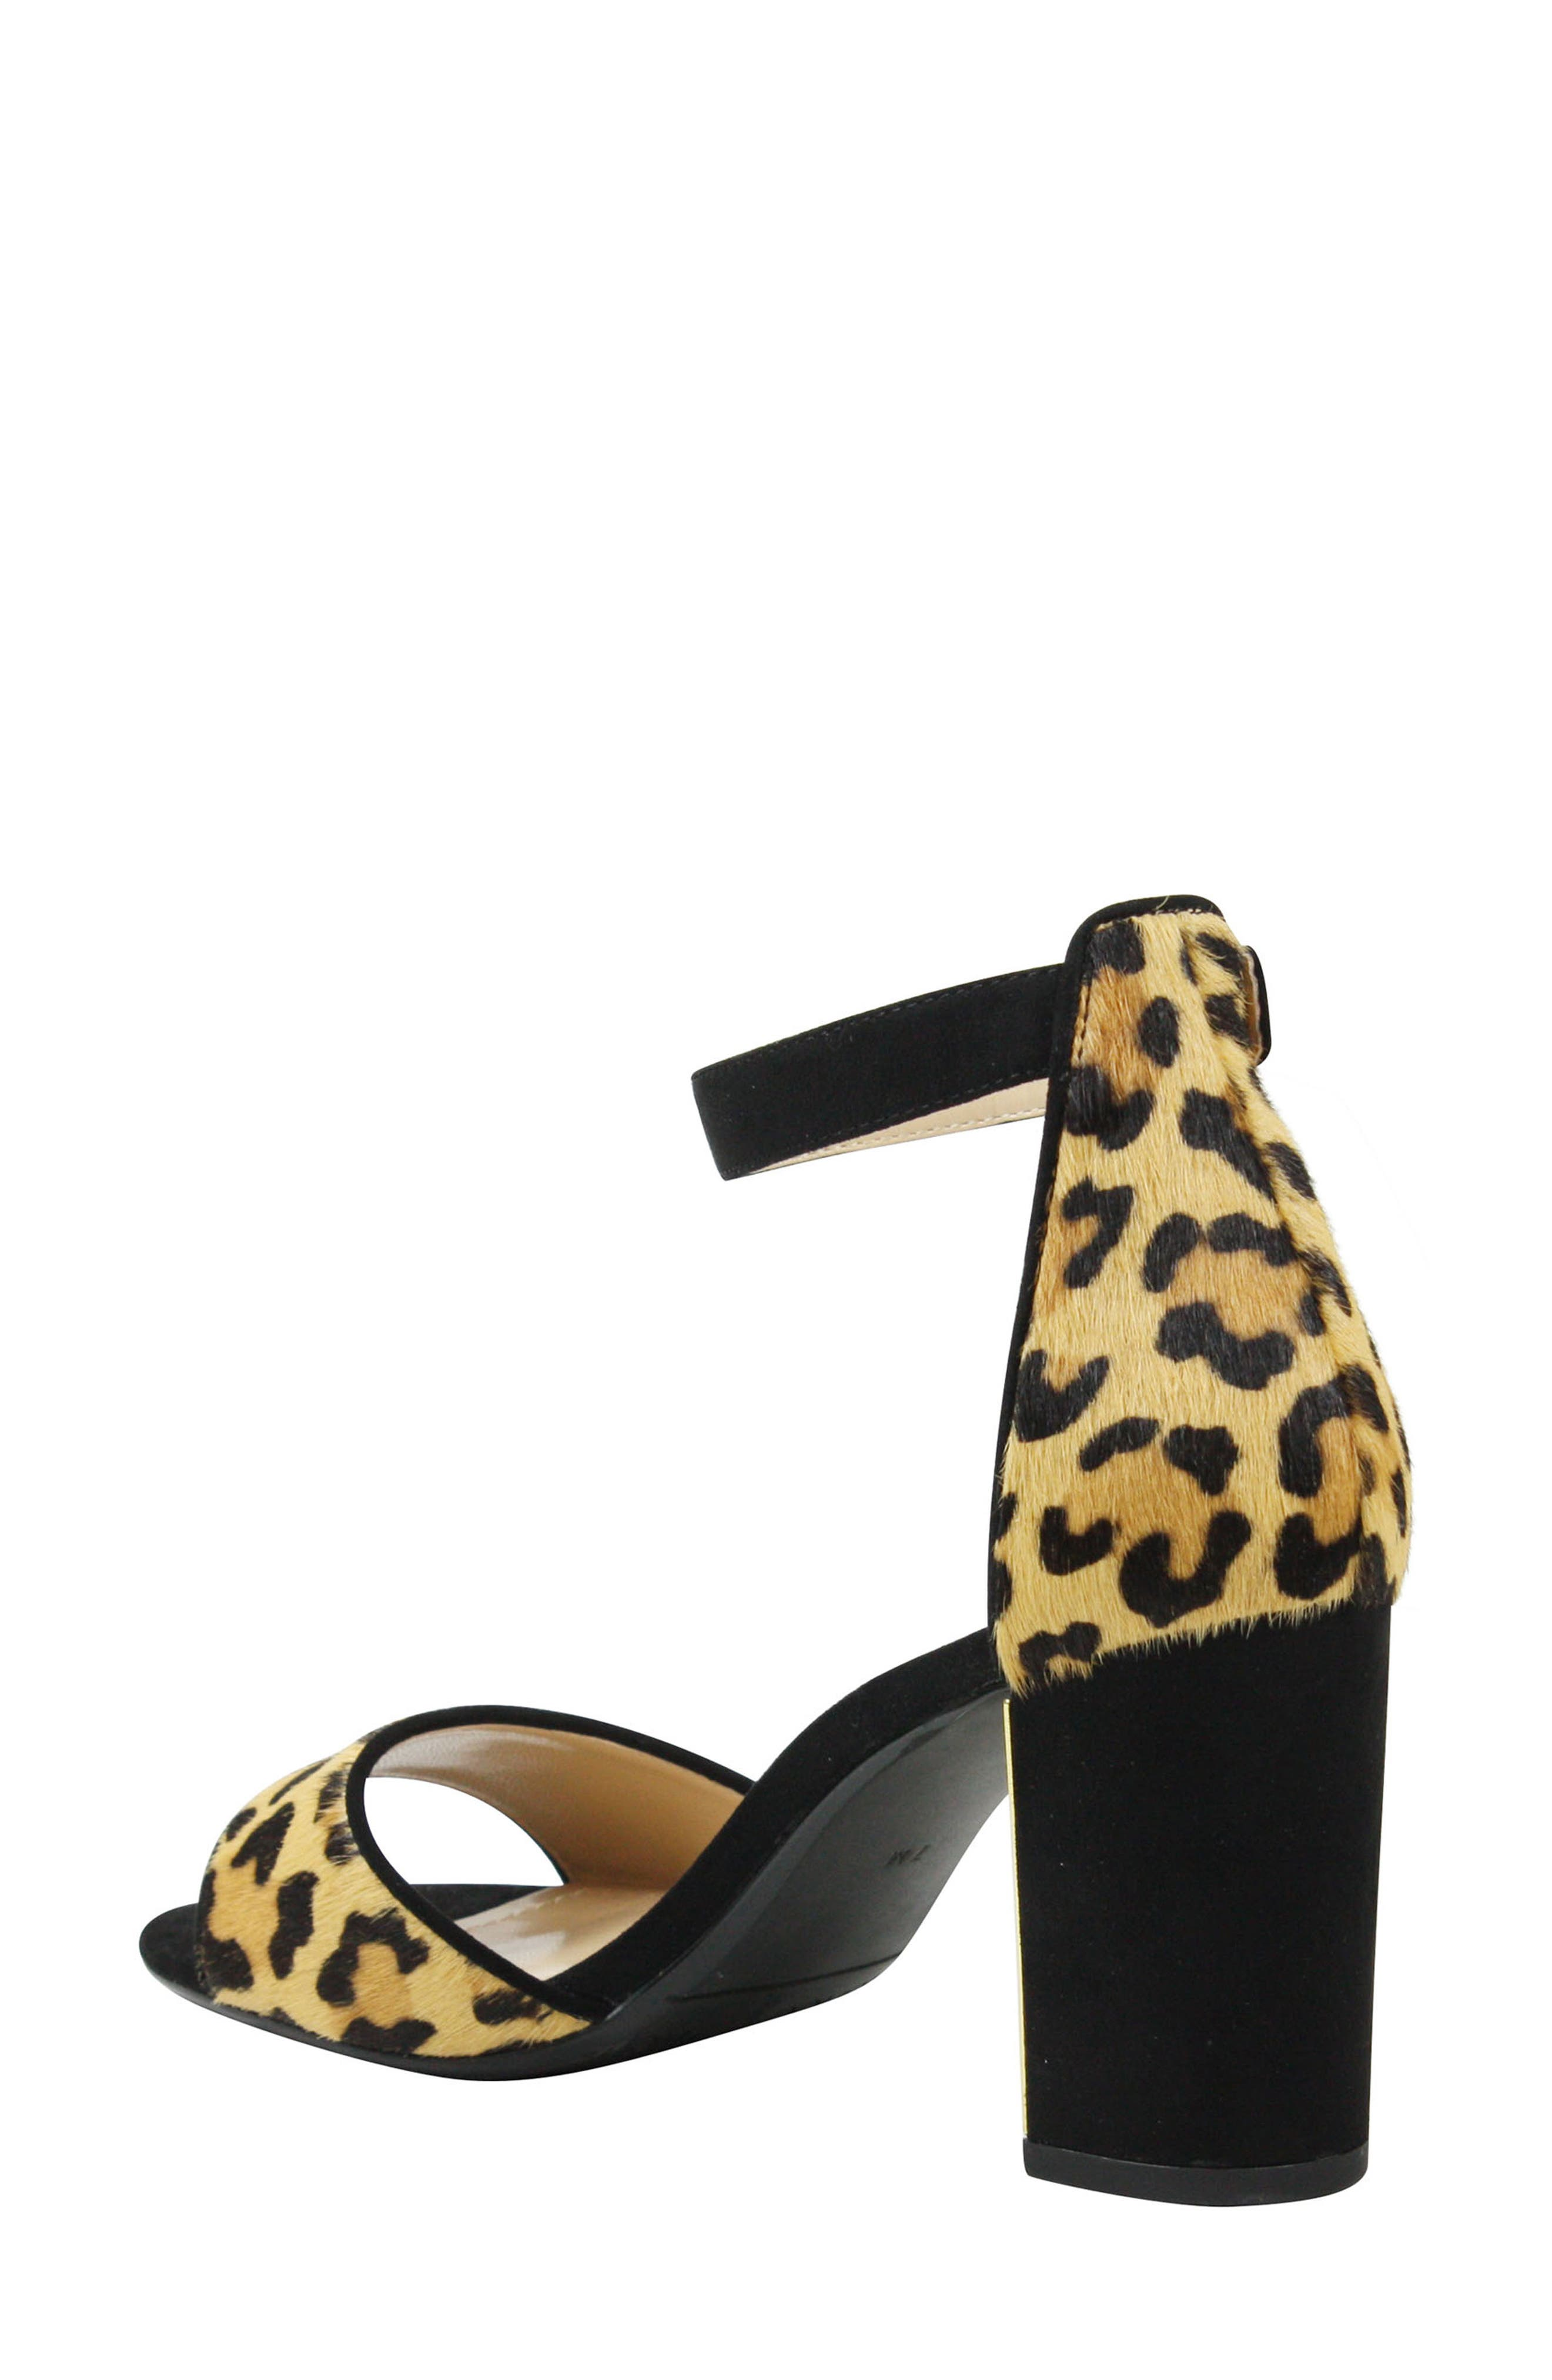 J. RENEÉ, Flaviana Ankle Strap Sandal, Alternate thumbnail 2, color, BLACK/ BROWN CALF HAIR